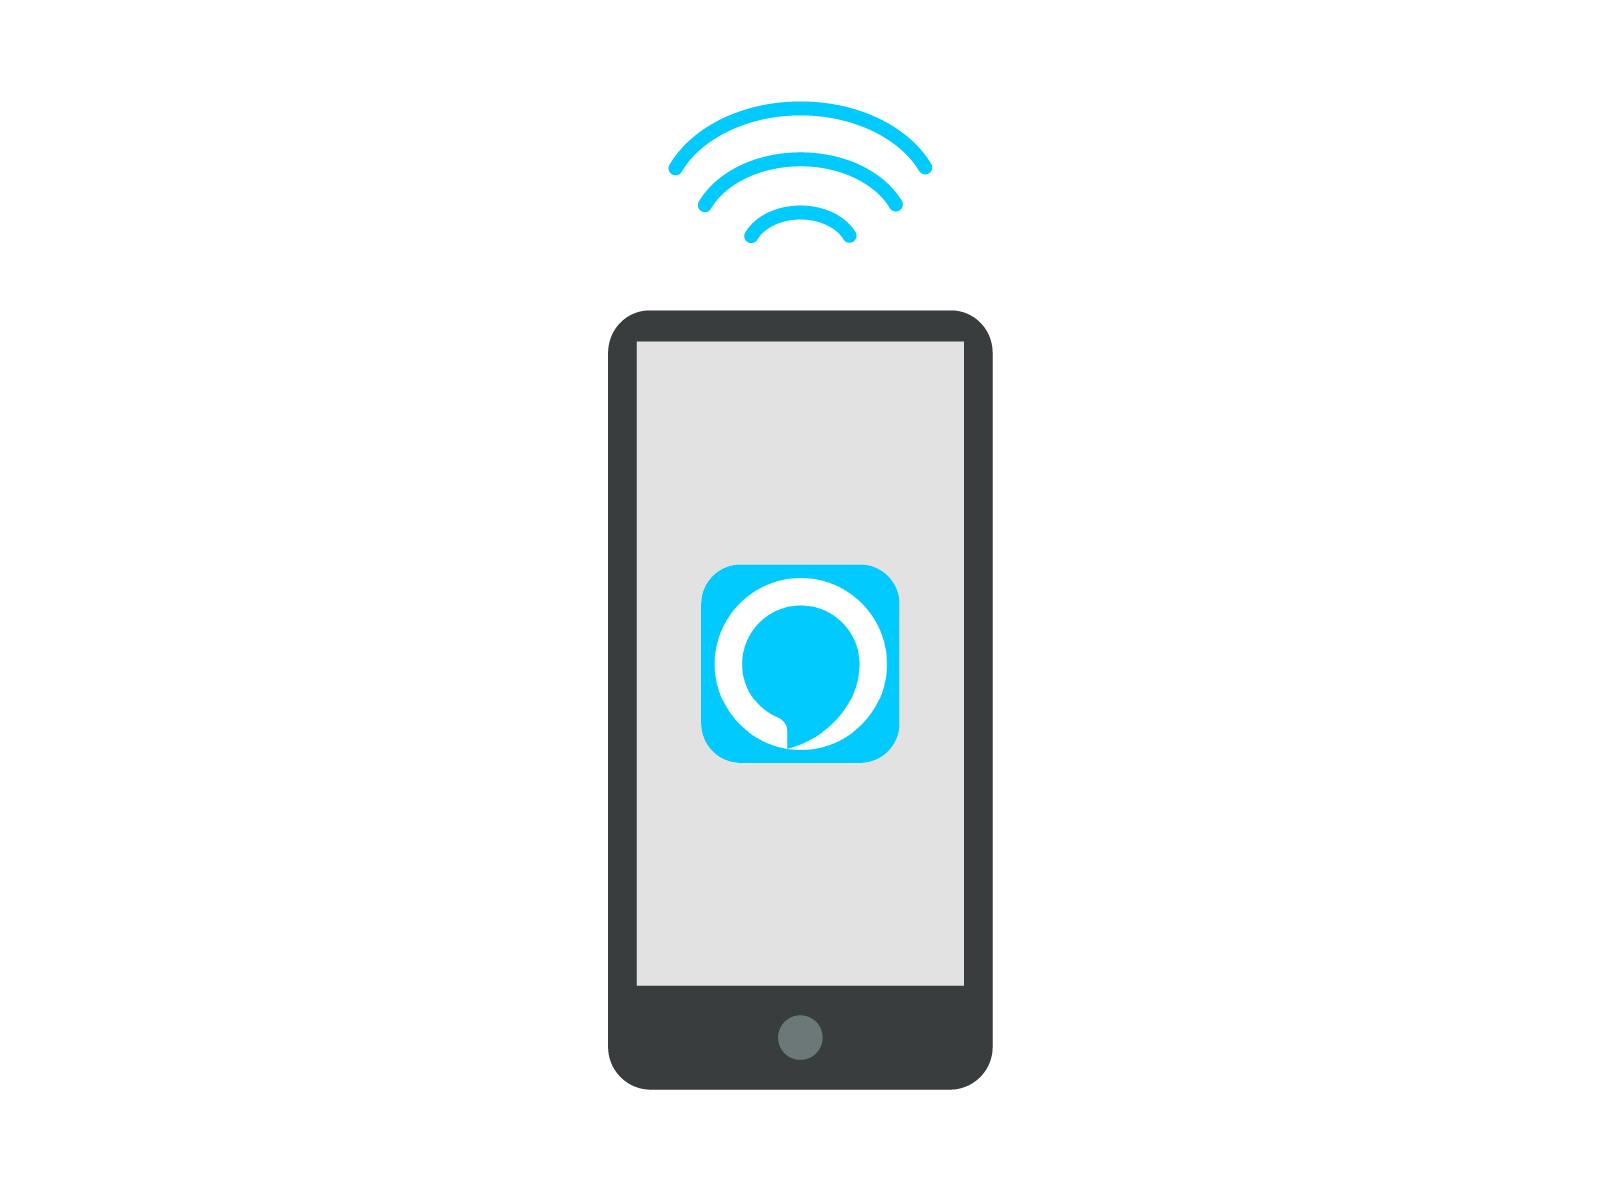 1. Open the Alexa app on your phone